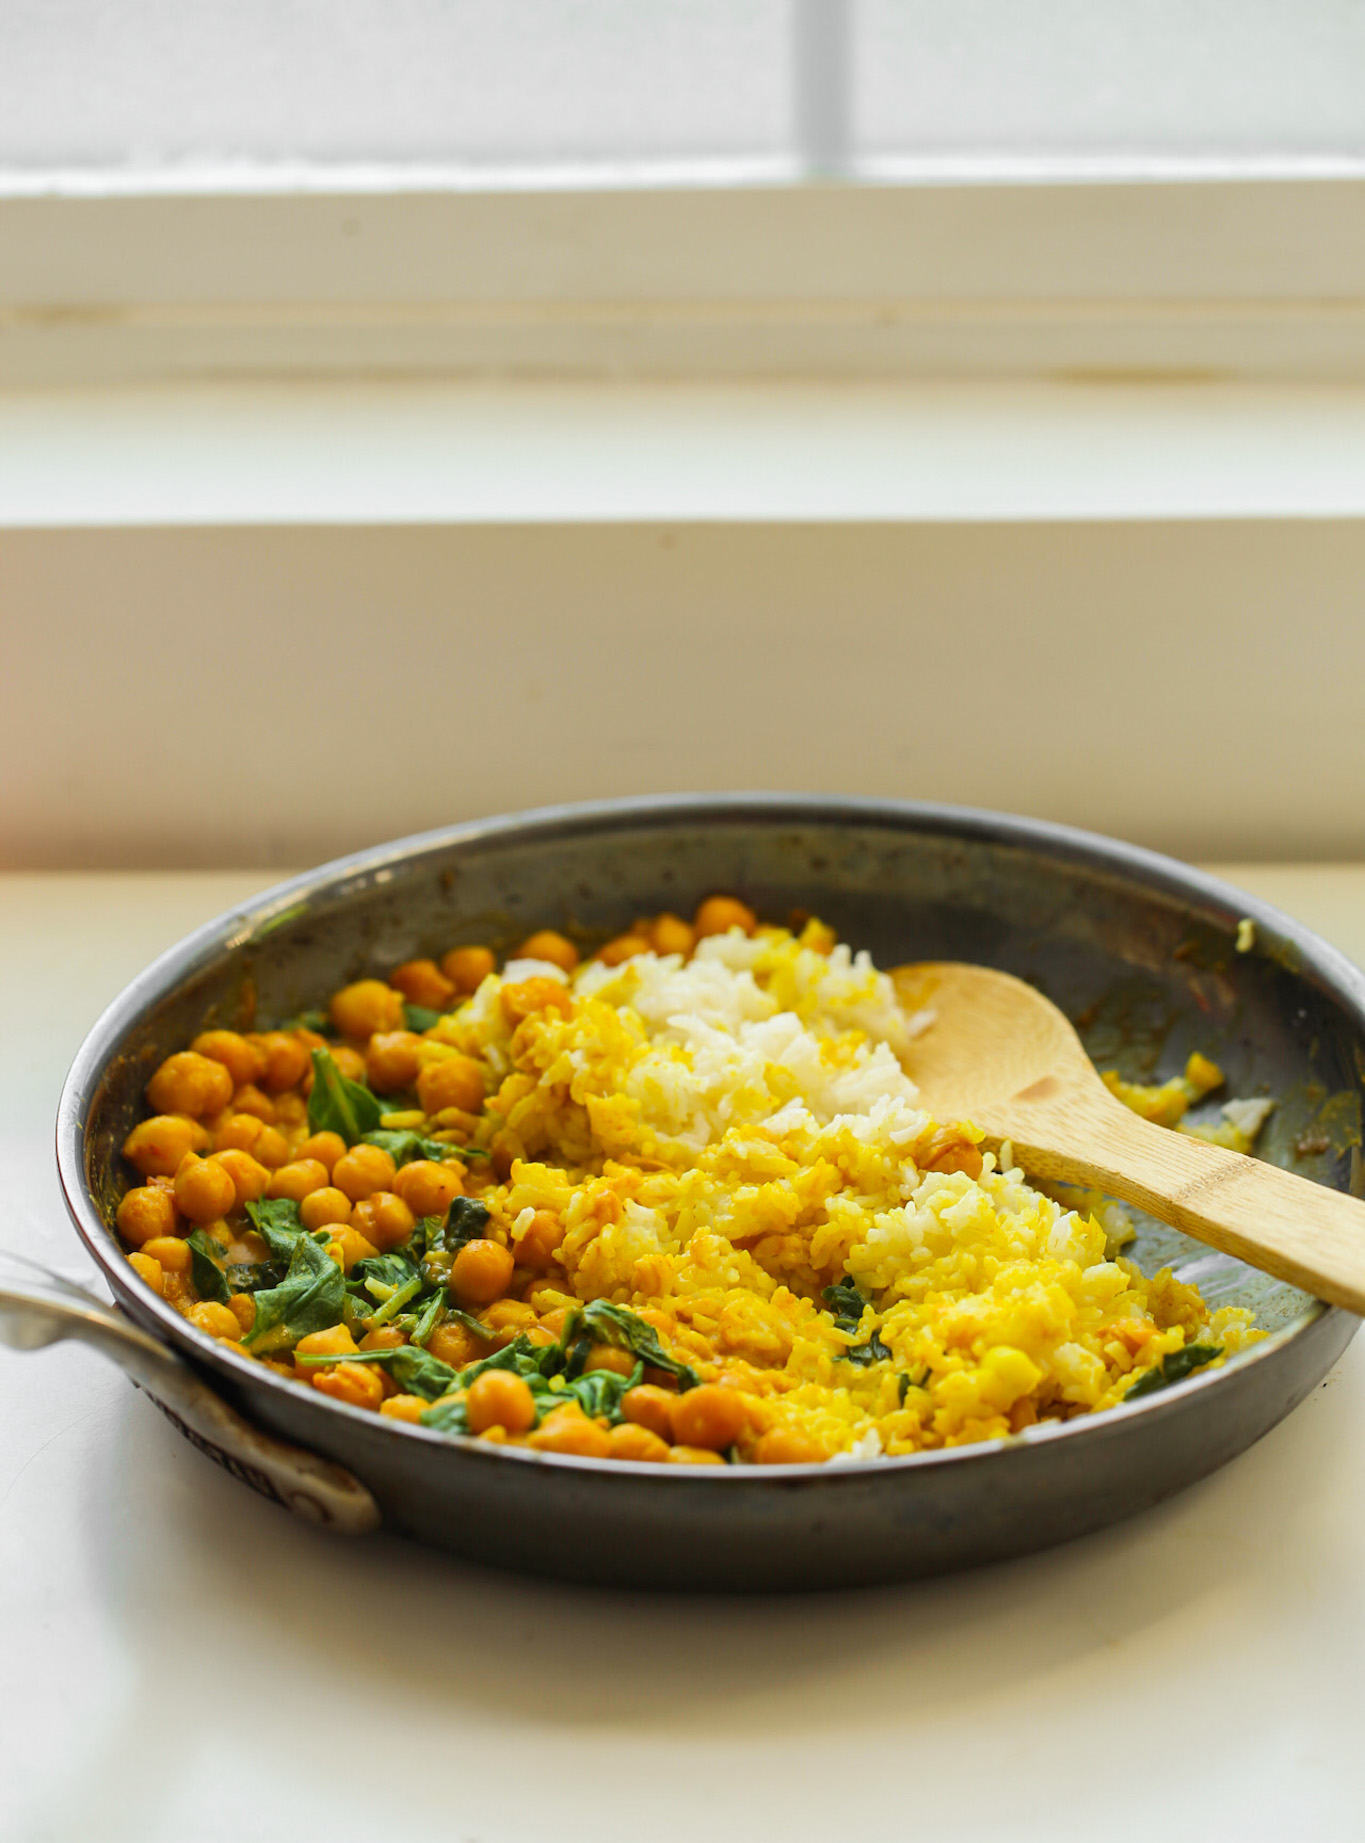 Veggie Rice Bowls skillet